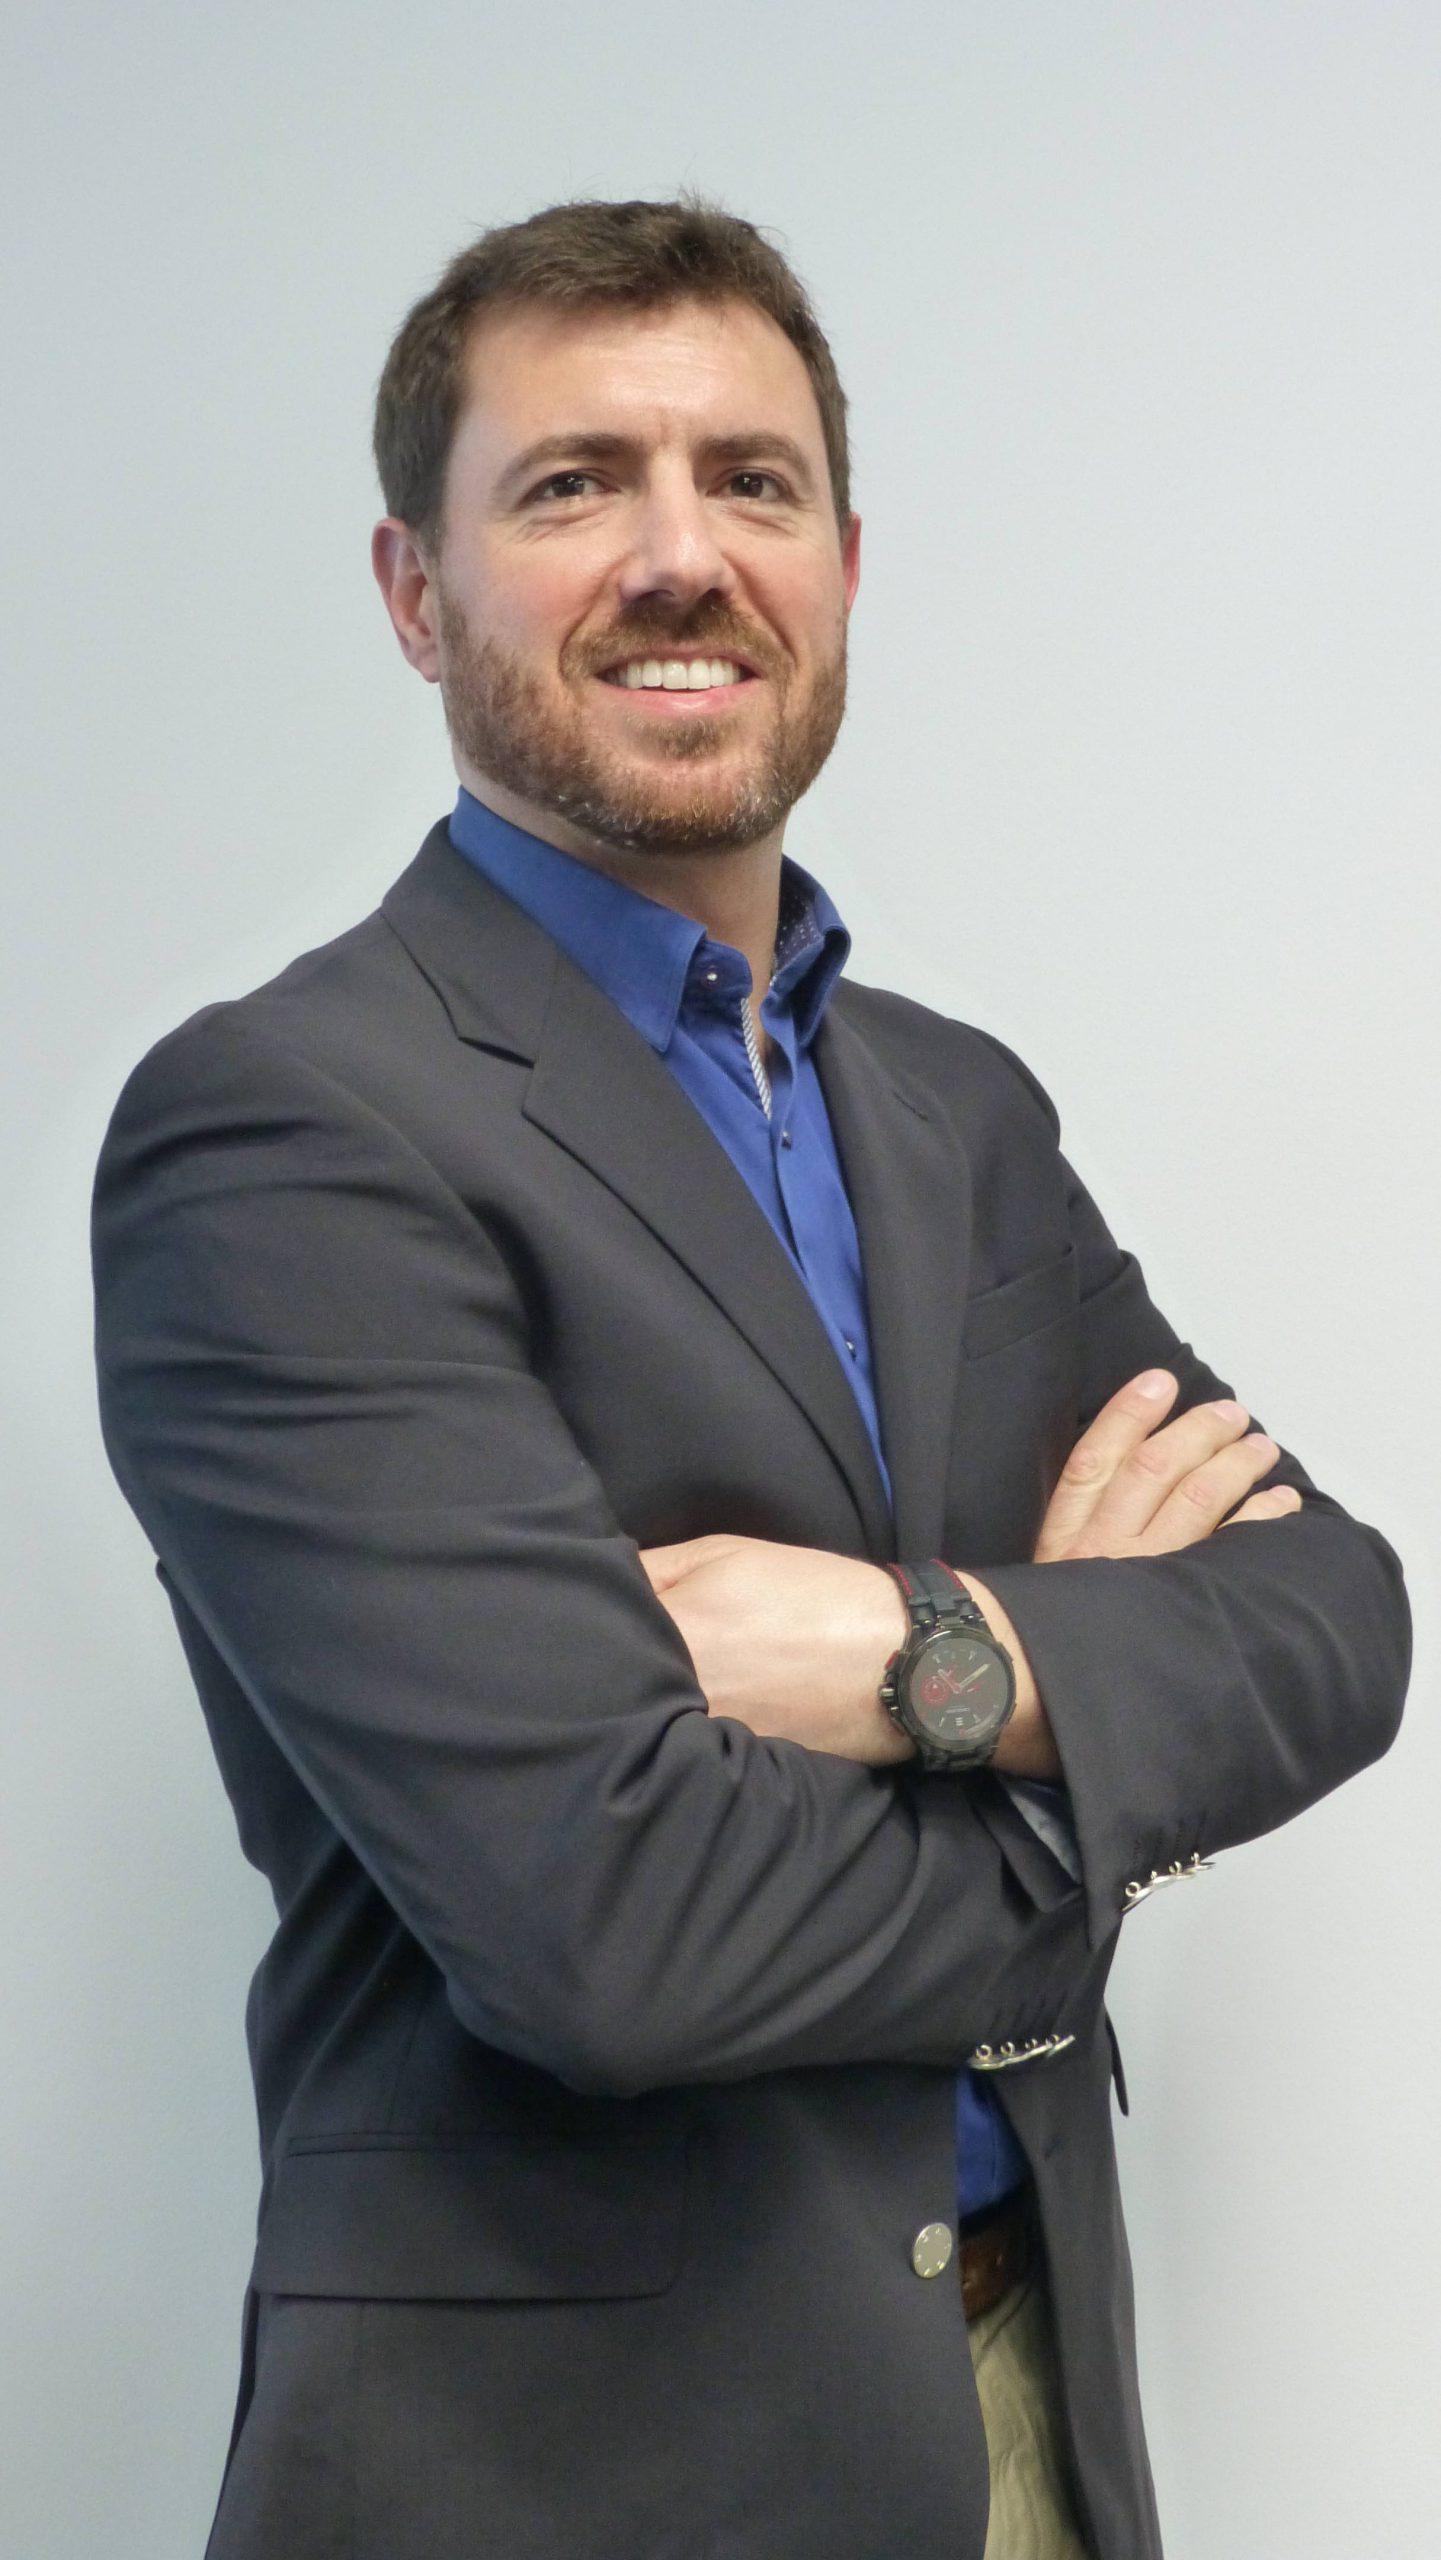 Pierre David Simonet